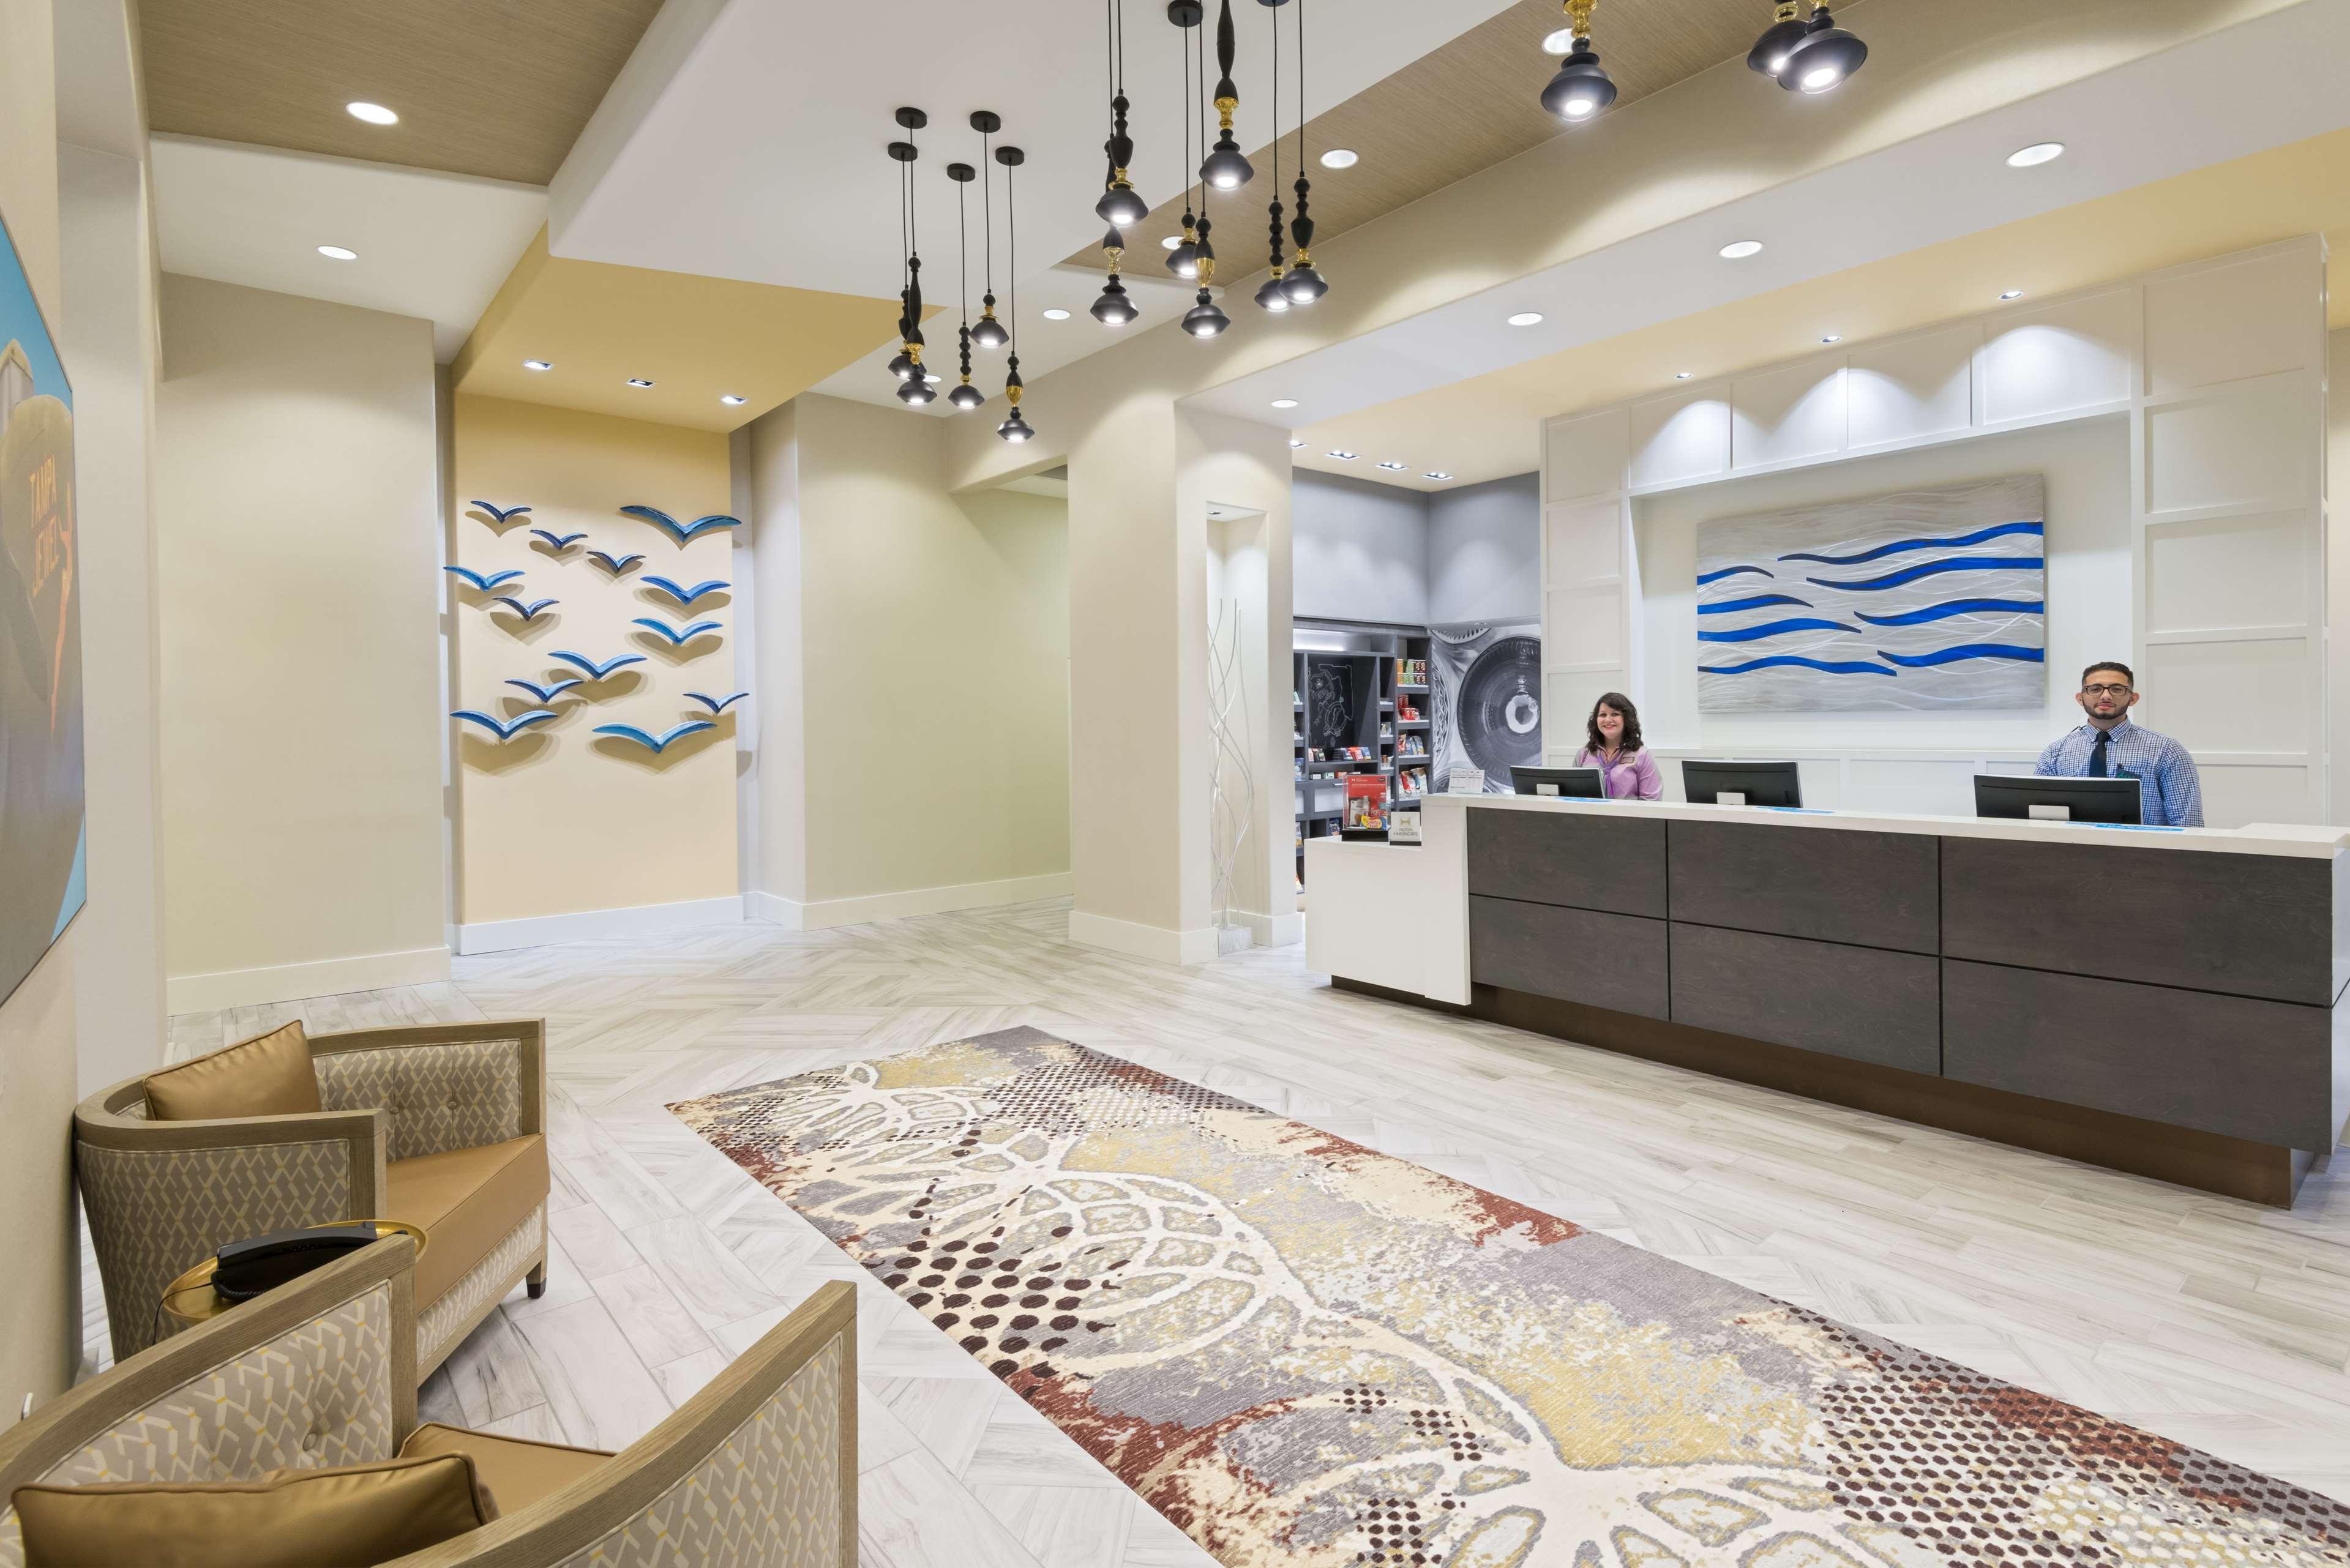 Hampton Inn & Suites Tampa Airport Avion Park Westshore image 4